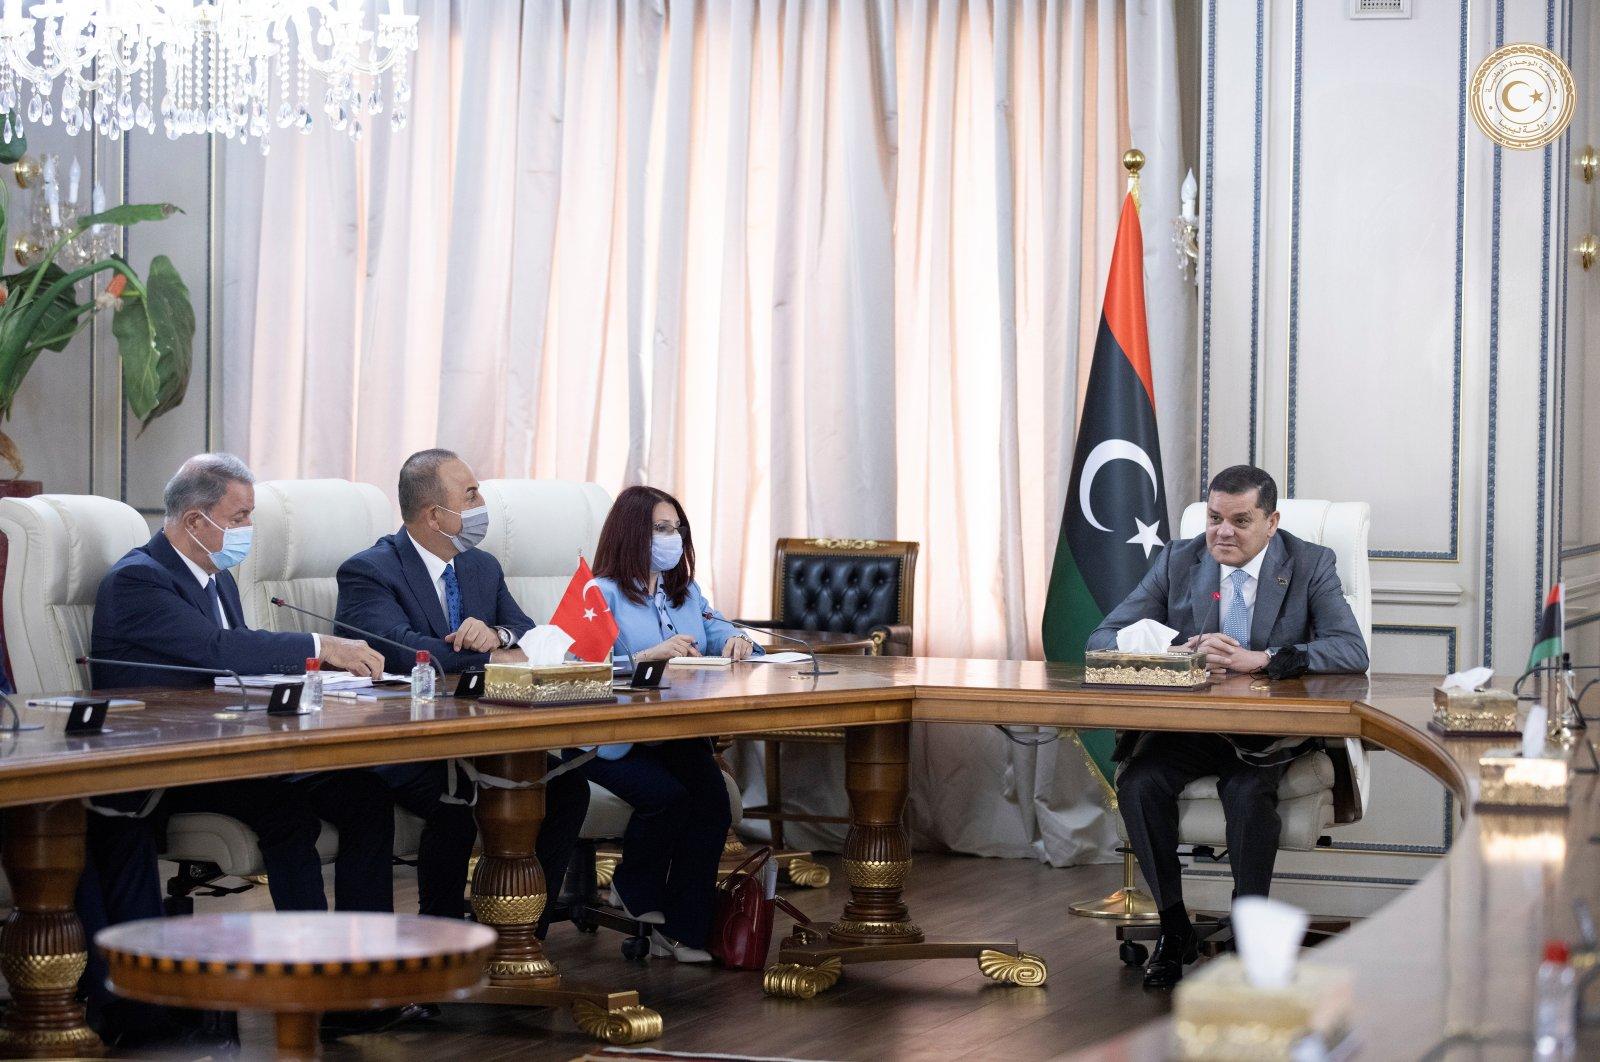 Turkish Foreign Minister Mevlüt Çavuşoğlu meets with Libyan Prime Minister Abdul Hamid Dbeibah, in Tripoli, Libya, May 3, 2021. (Reuters Photo)